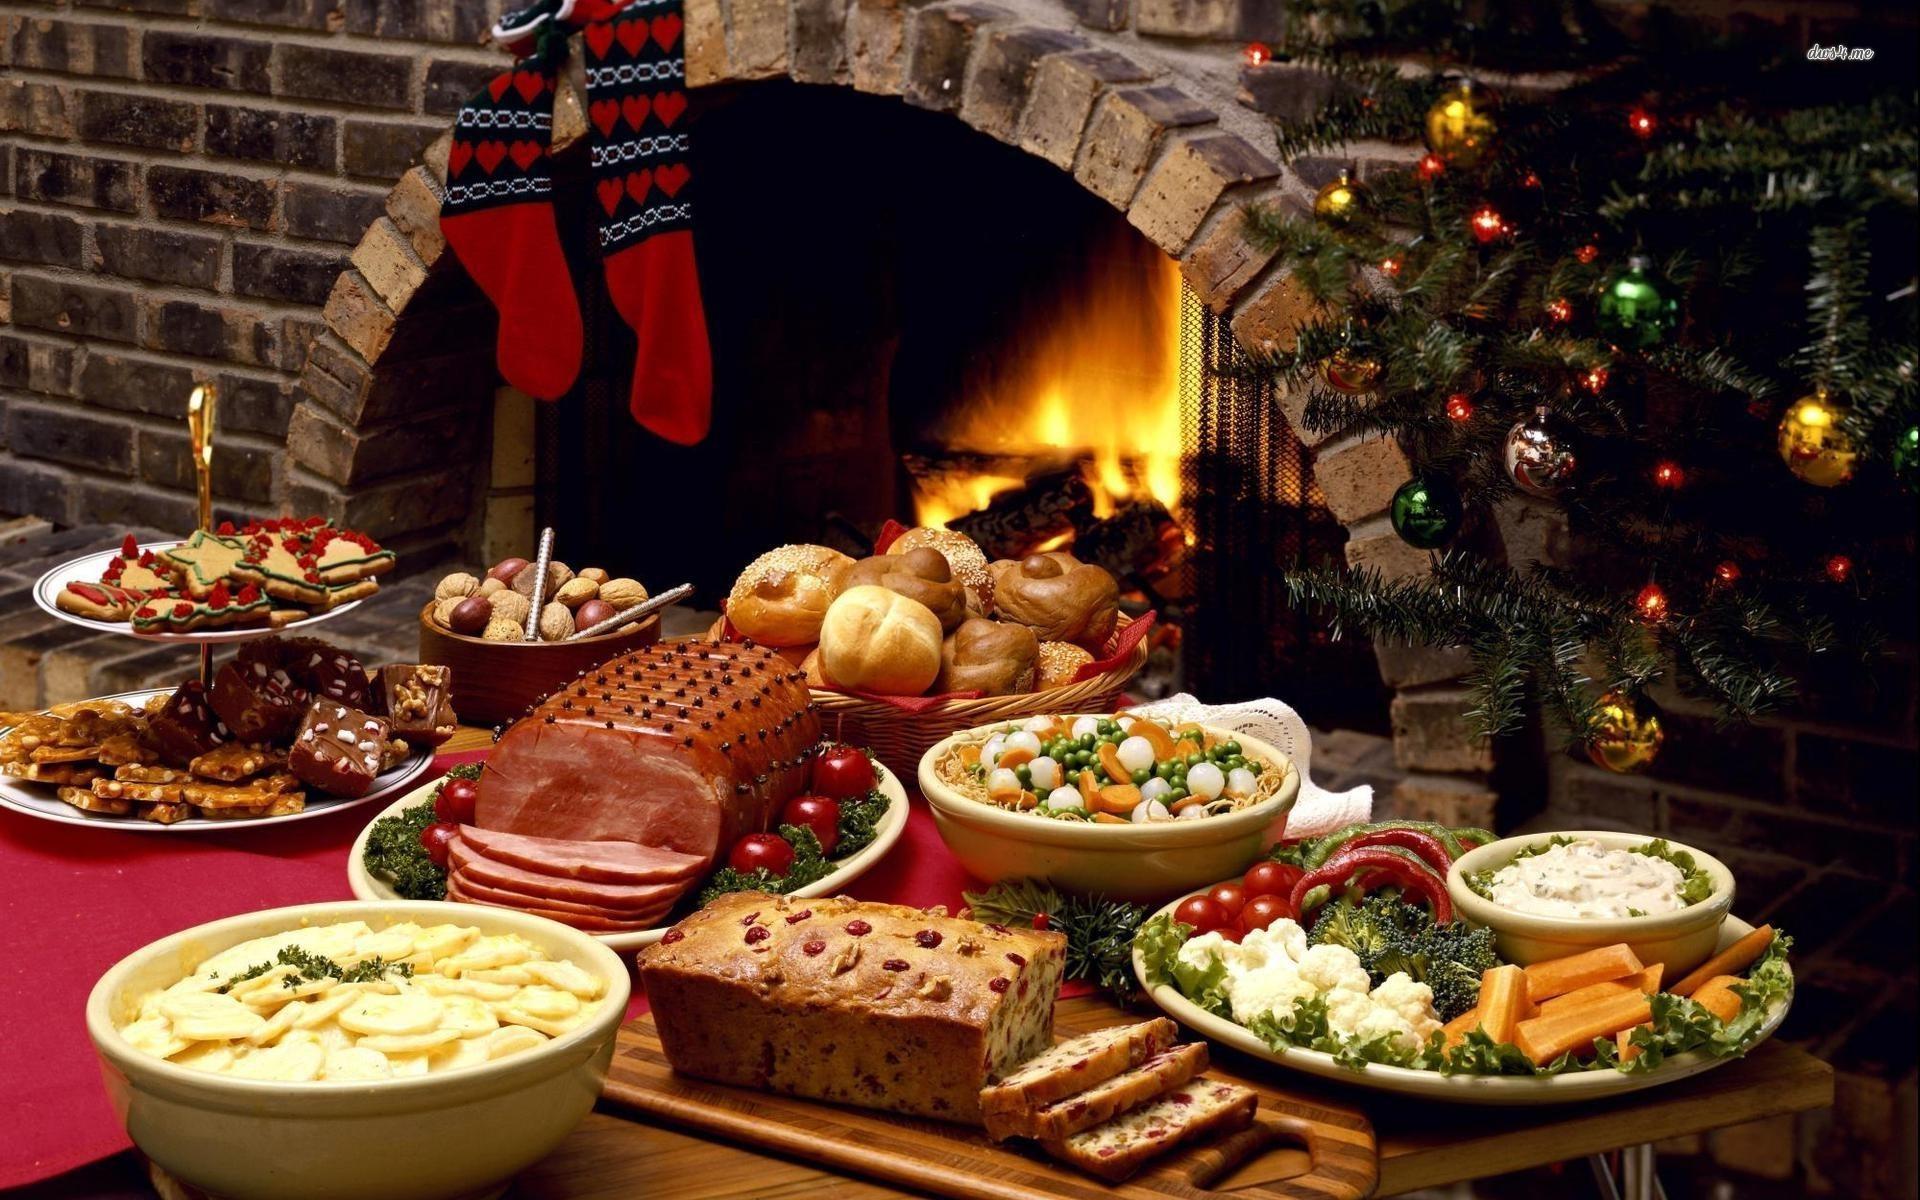 Christmas Dinner Ideas 2017  Christmas dinner ideas for a crowd nontraditional menu